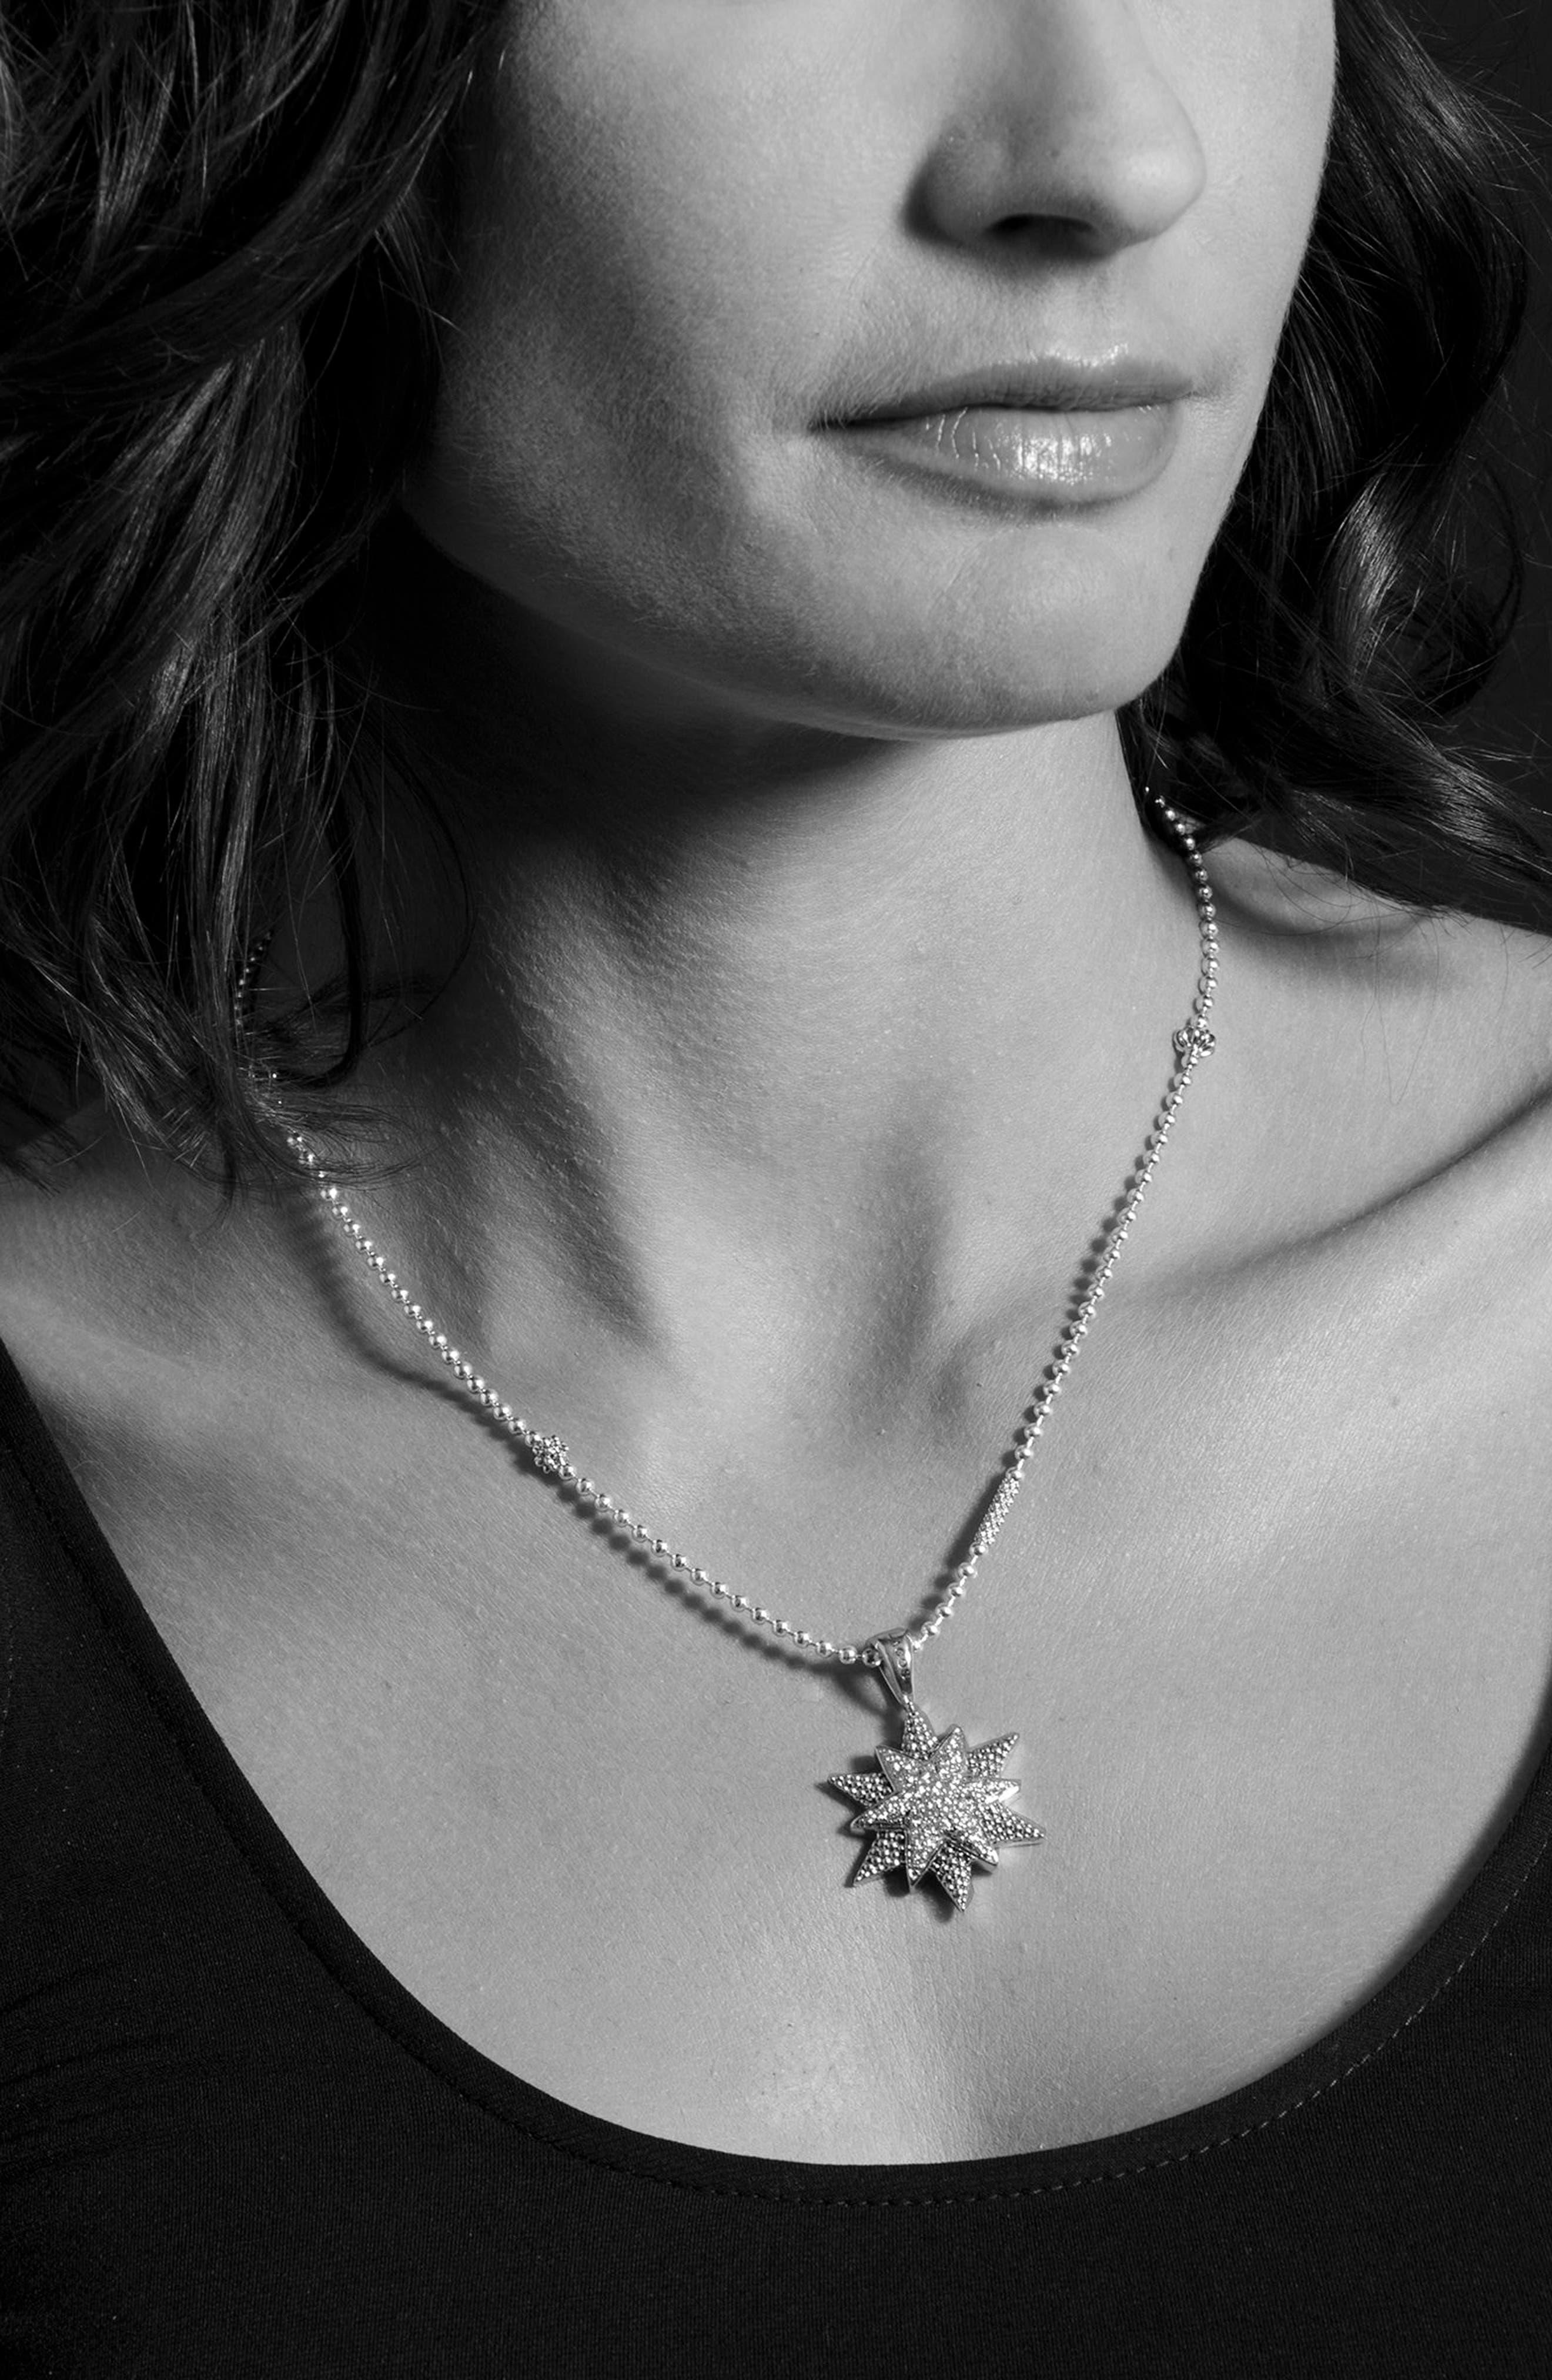 North Star Large Diamond Pendant Necklace,                             Alternate thumbnail 2, color,                             Diamond